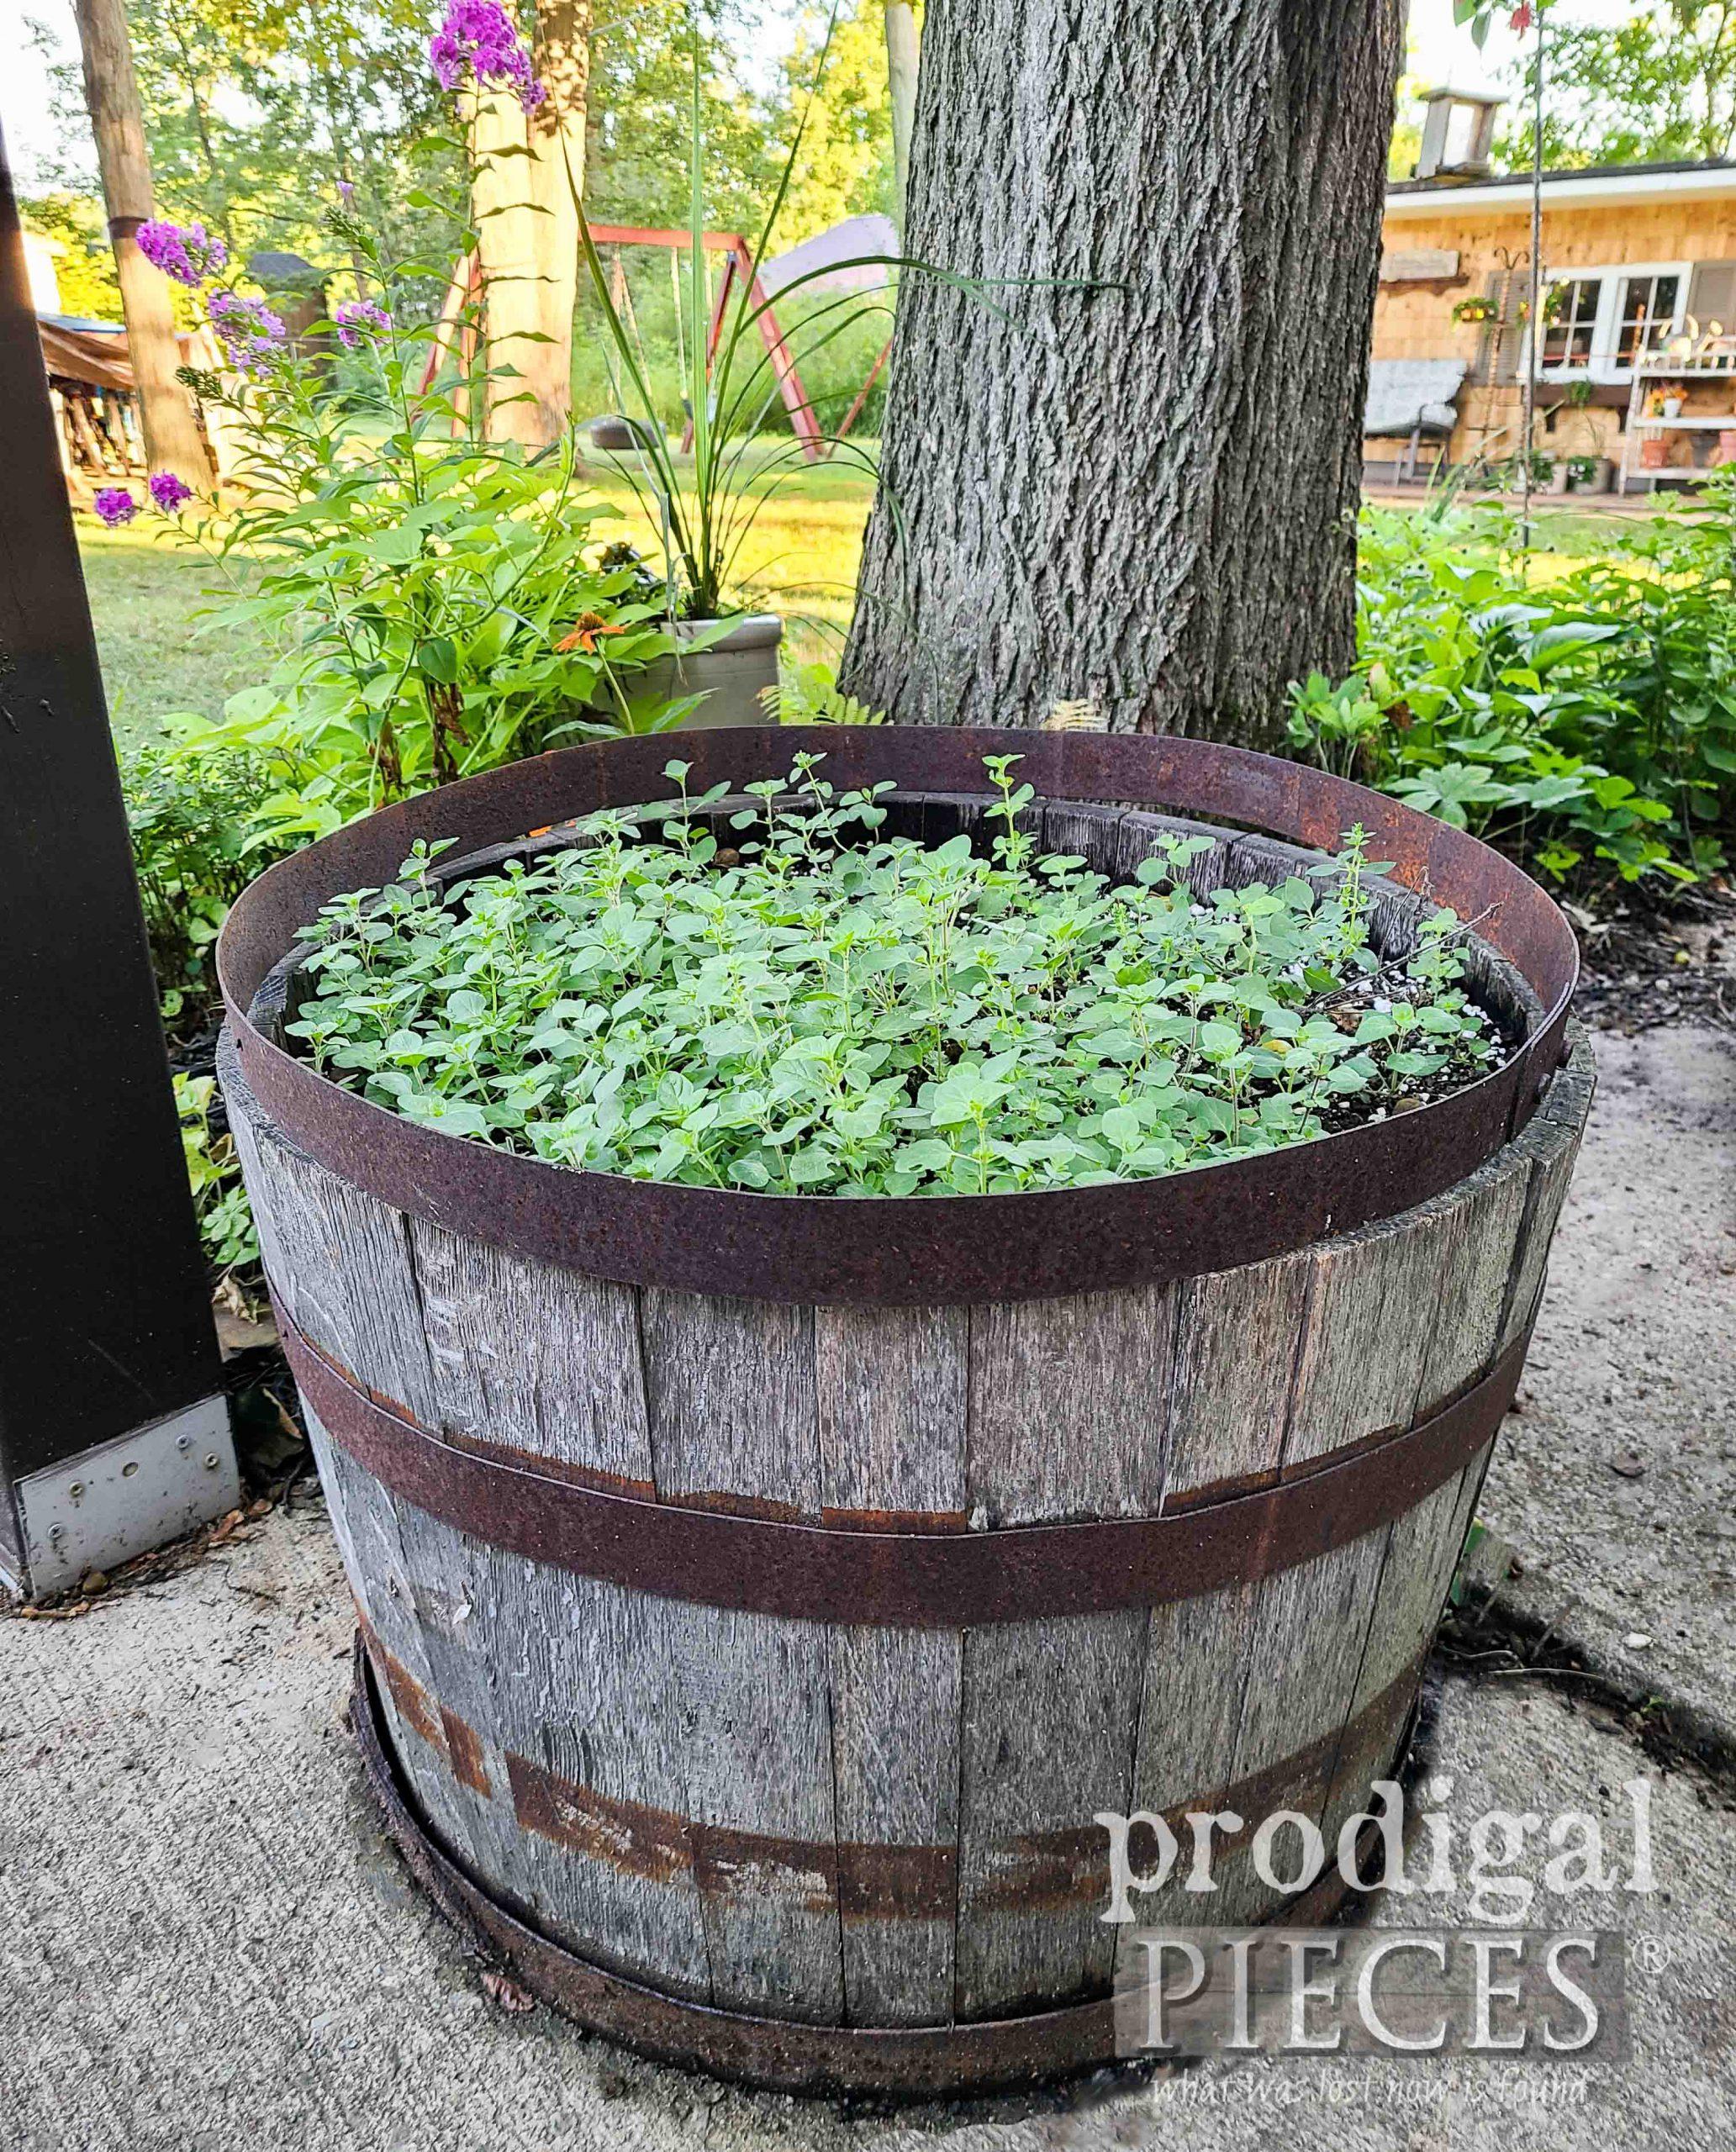 Whiskey Planter Full of Oregano   prodigalpieces.com #prodigalpieces #garden #gardening #herbs